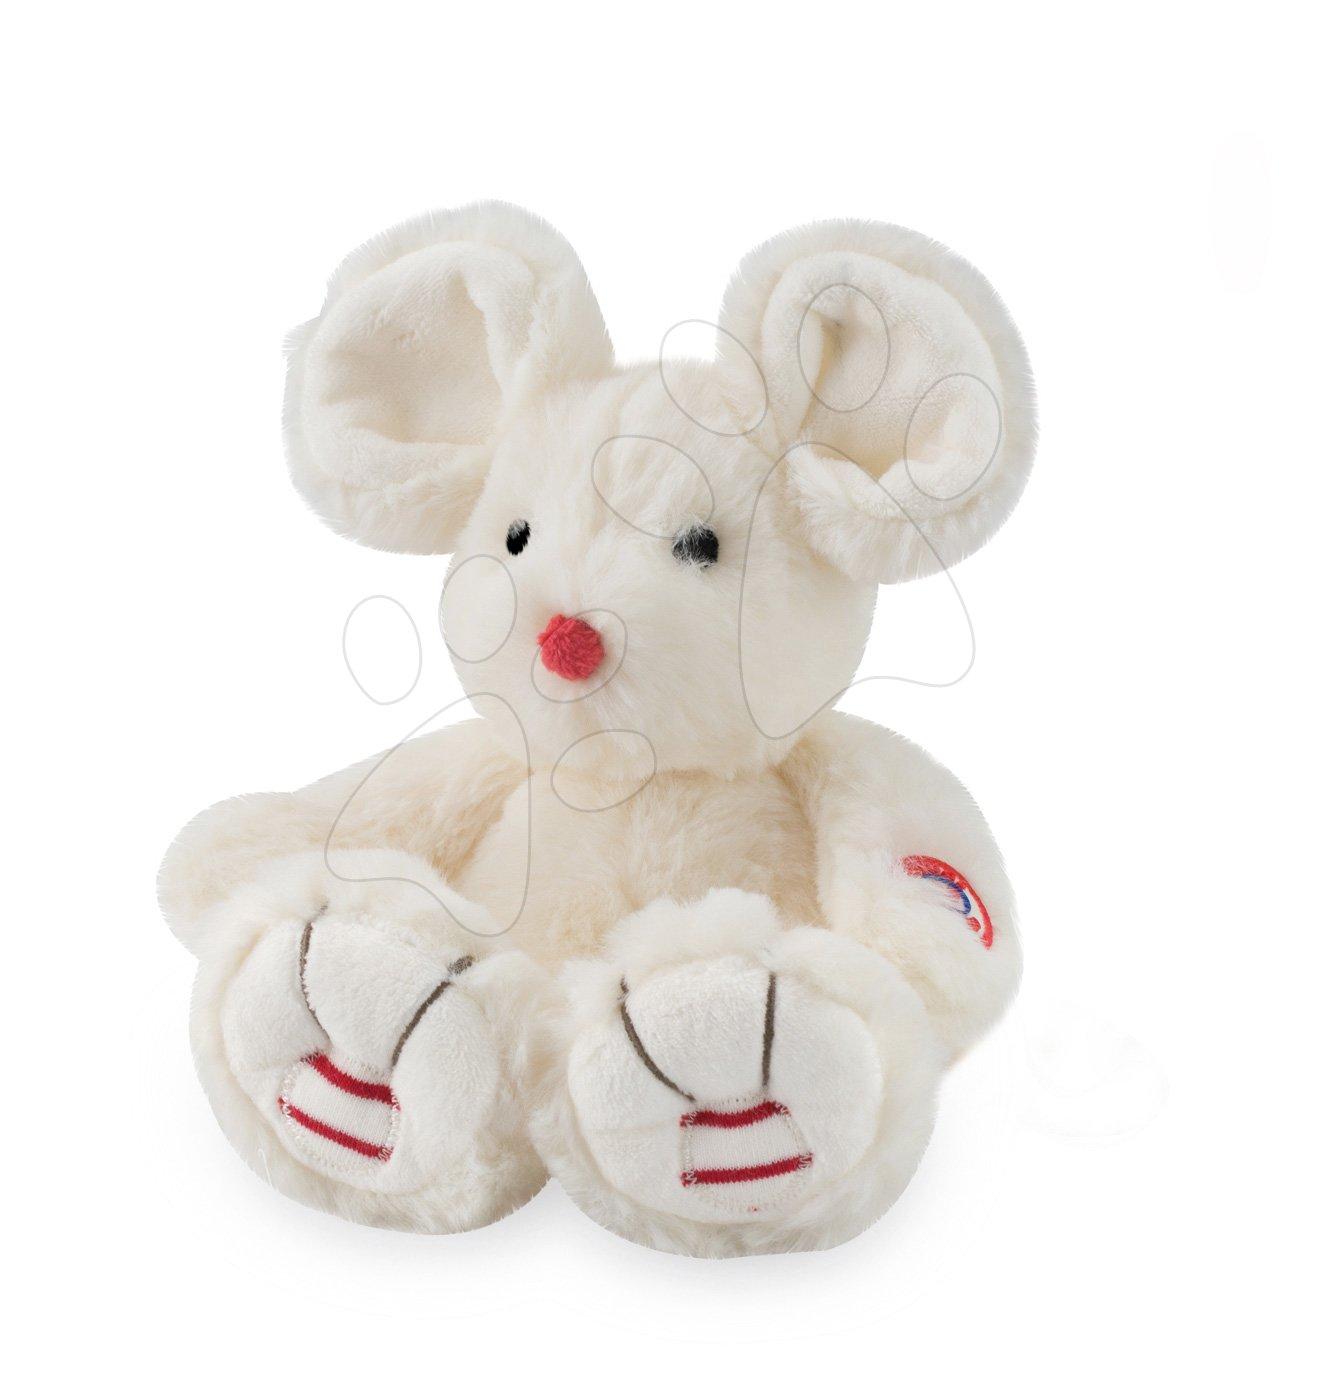 Plyšové zvieratká - Plyšová myška Rouge Kaloo 19 cm pre najmenších krémová